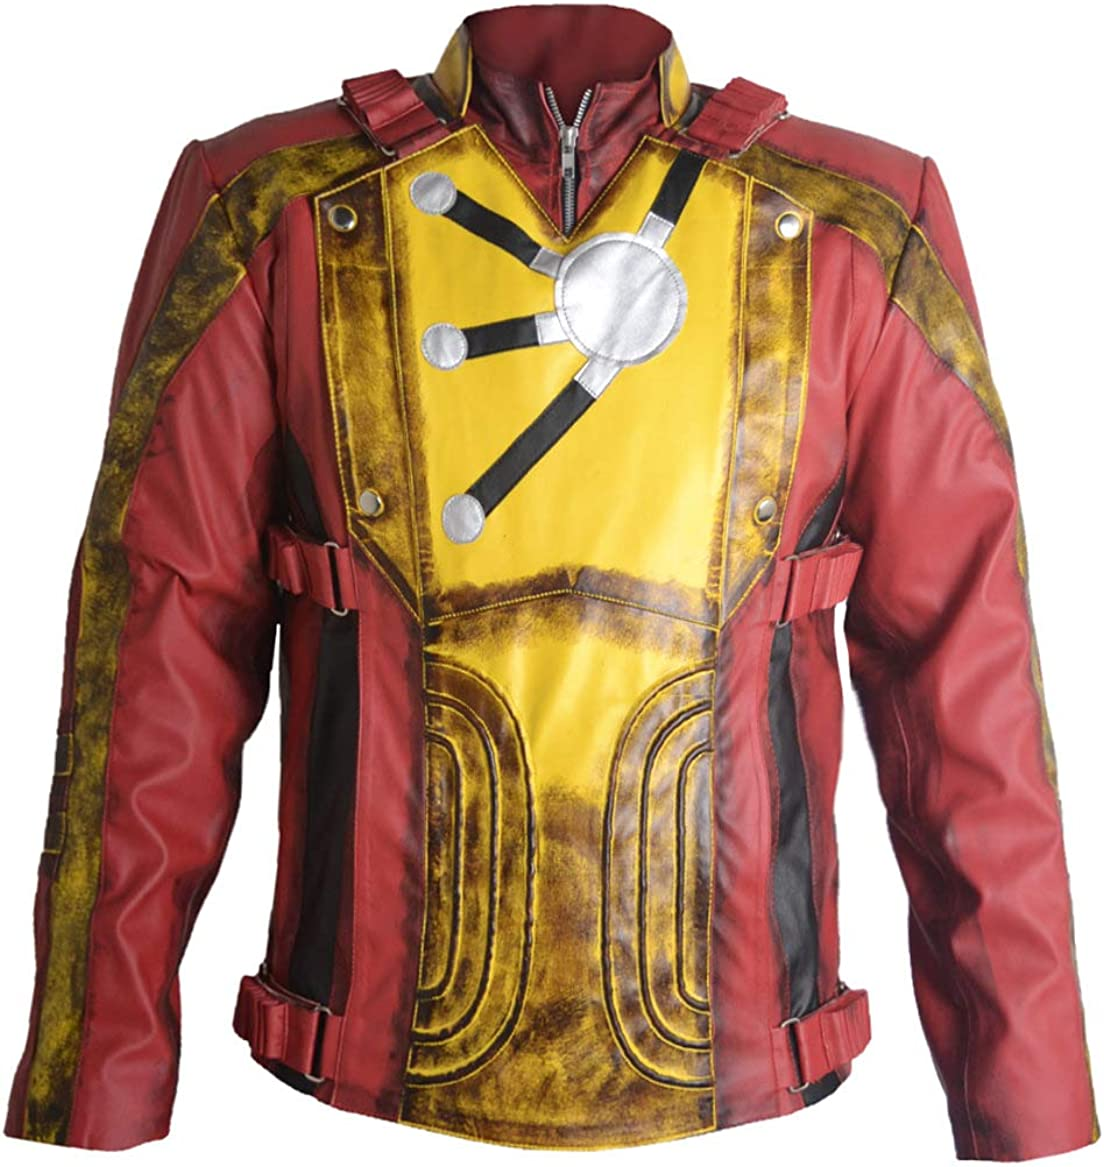 Stormwise Mens Firestorm Fashion Legends of Tomorrow Leather Jacket